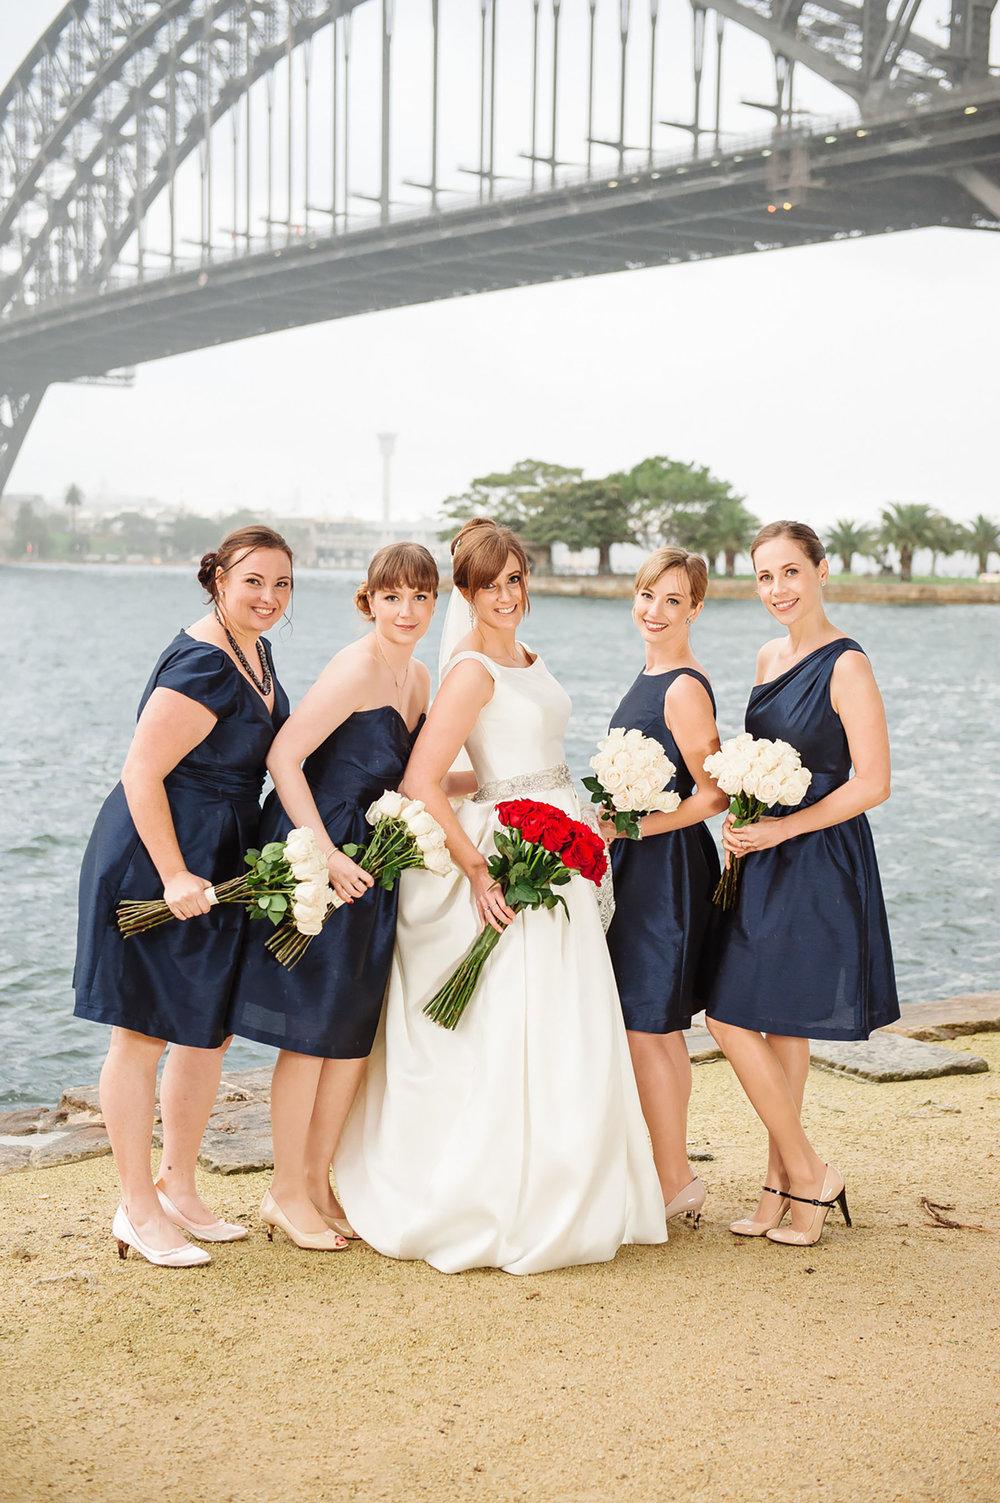 Marryme_wedding_photography_dorrigo_bellingen_photographer_21.jpg